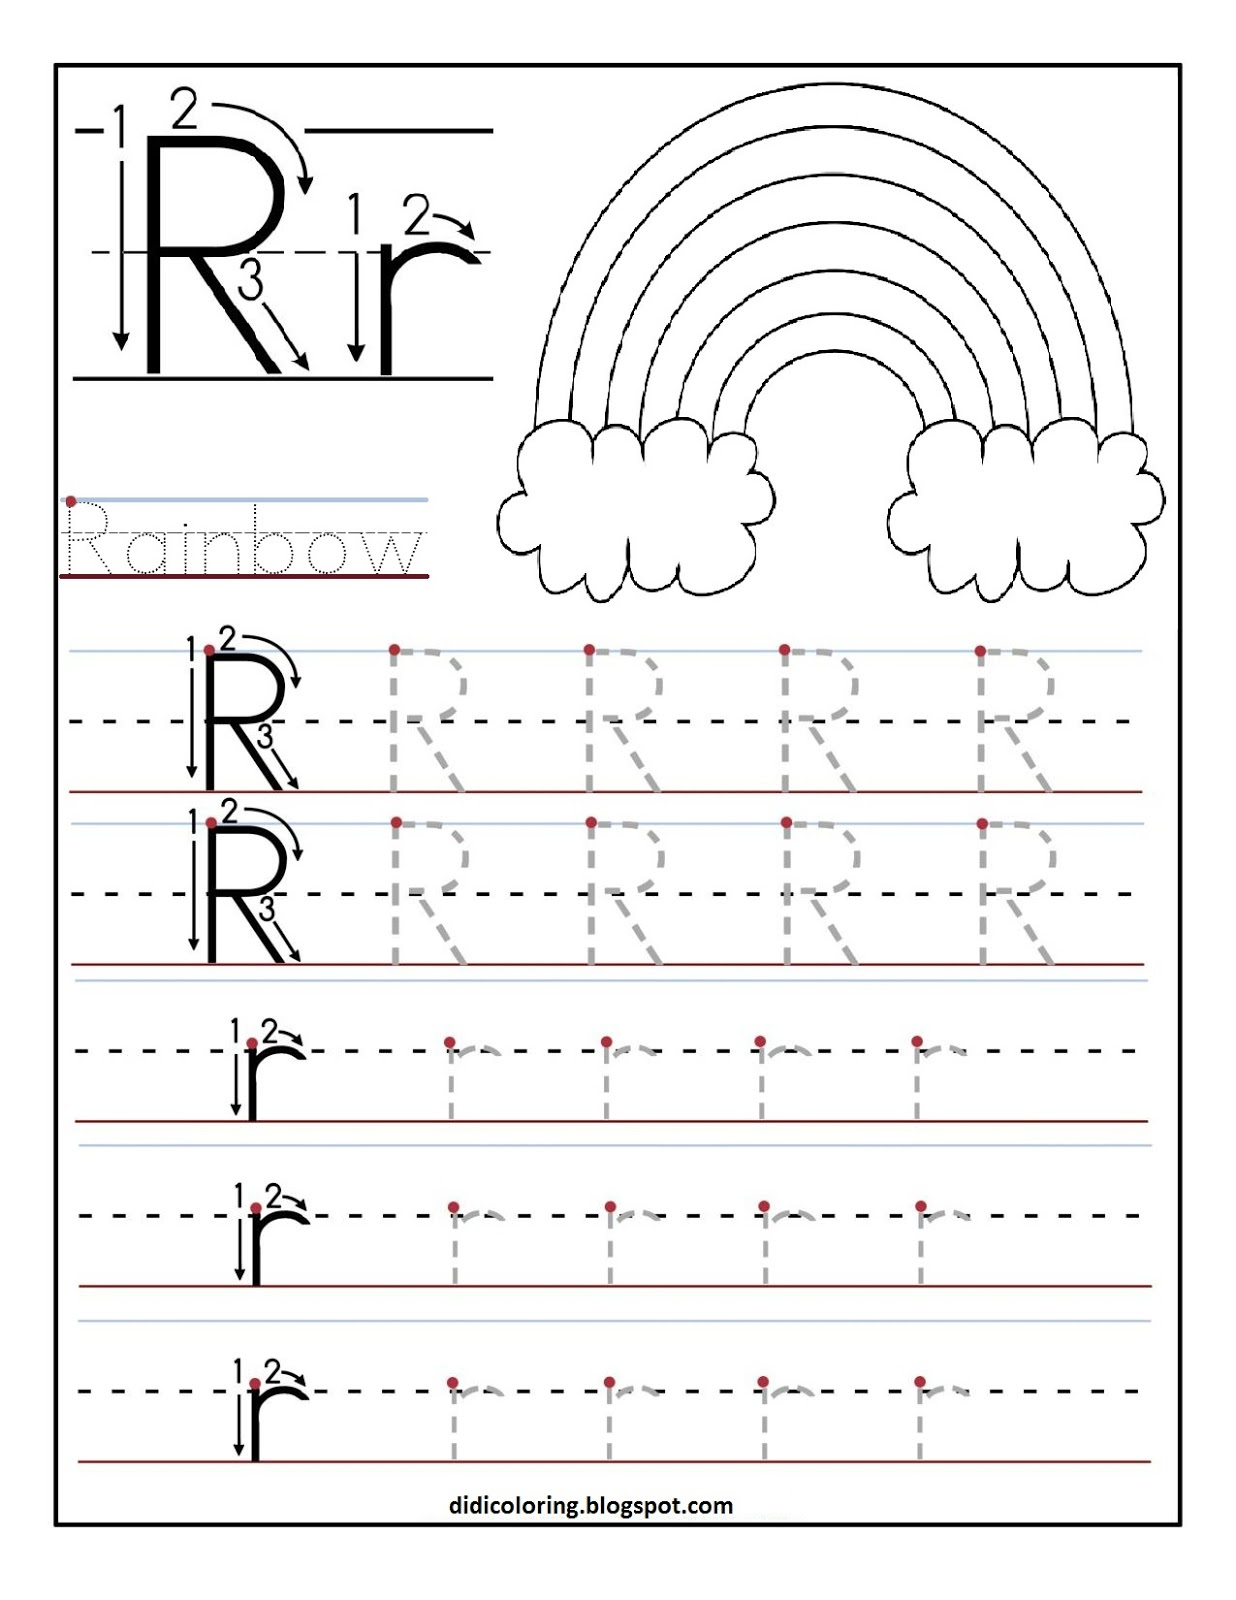 math worksheet : accessoris related : Free Printable Letter Worksheets For Kindergarten